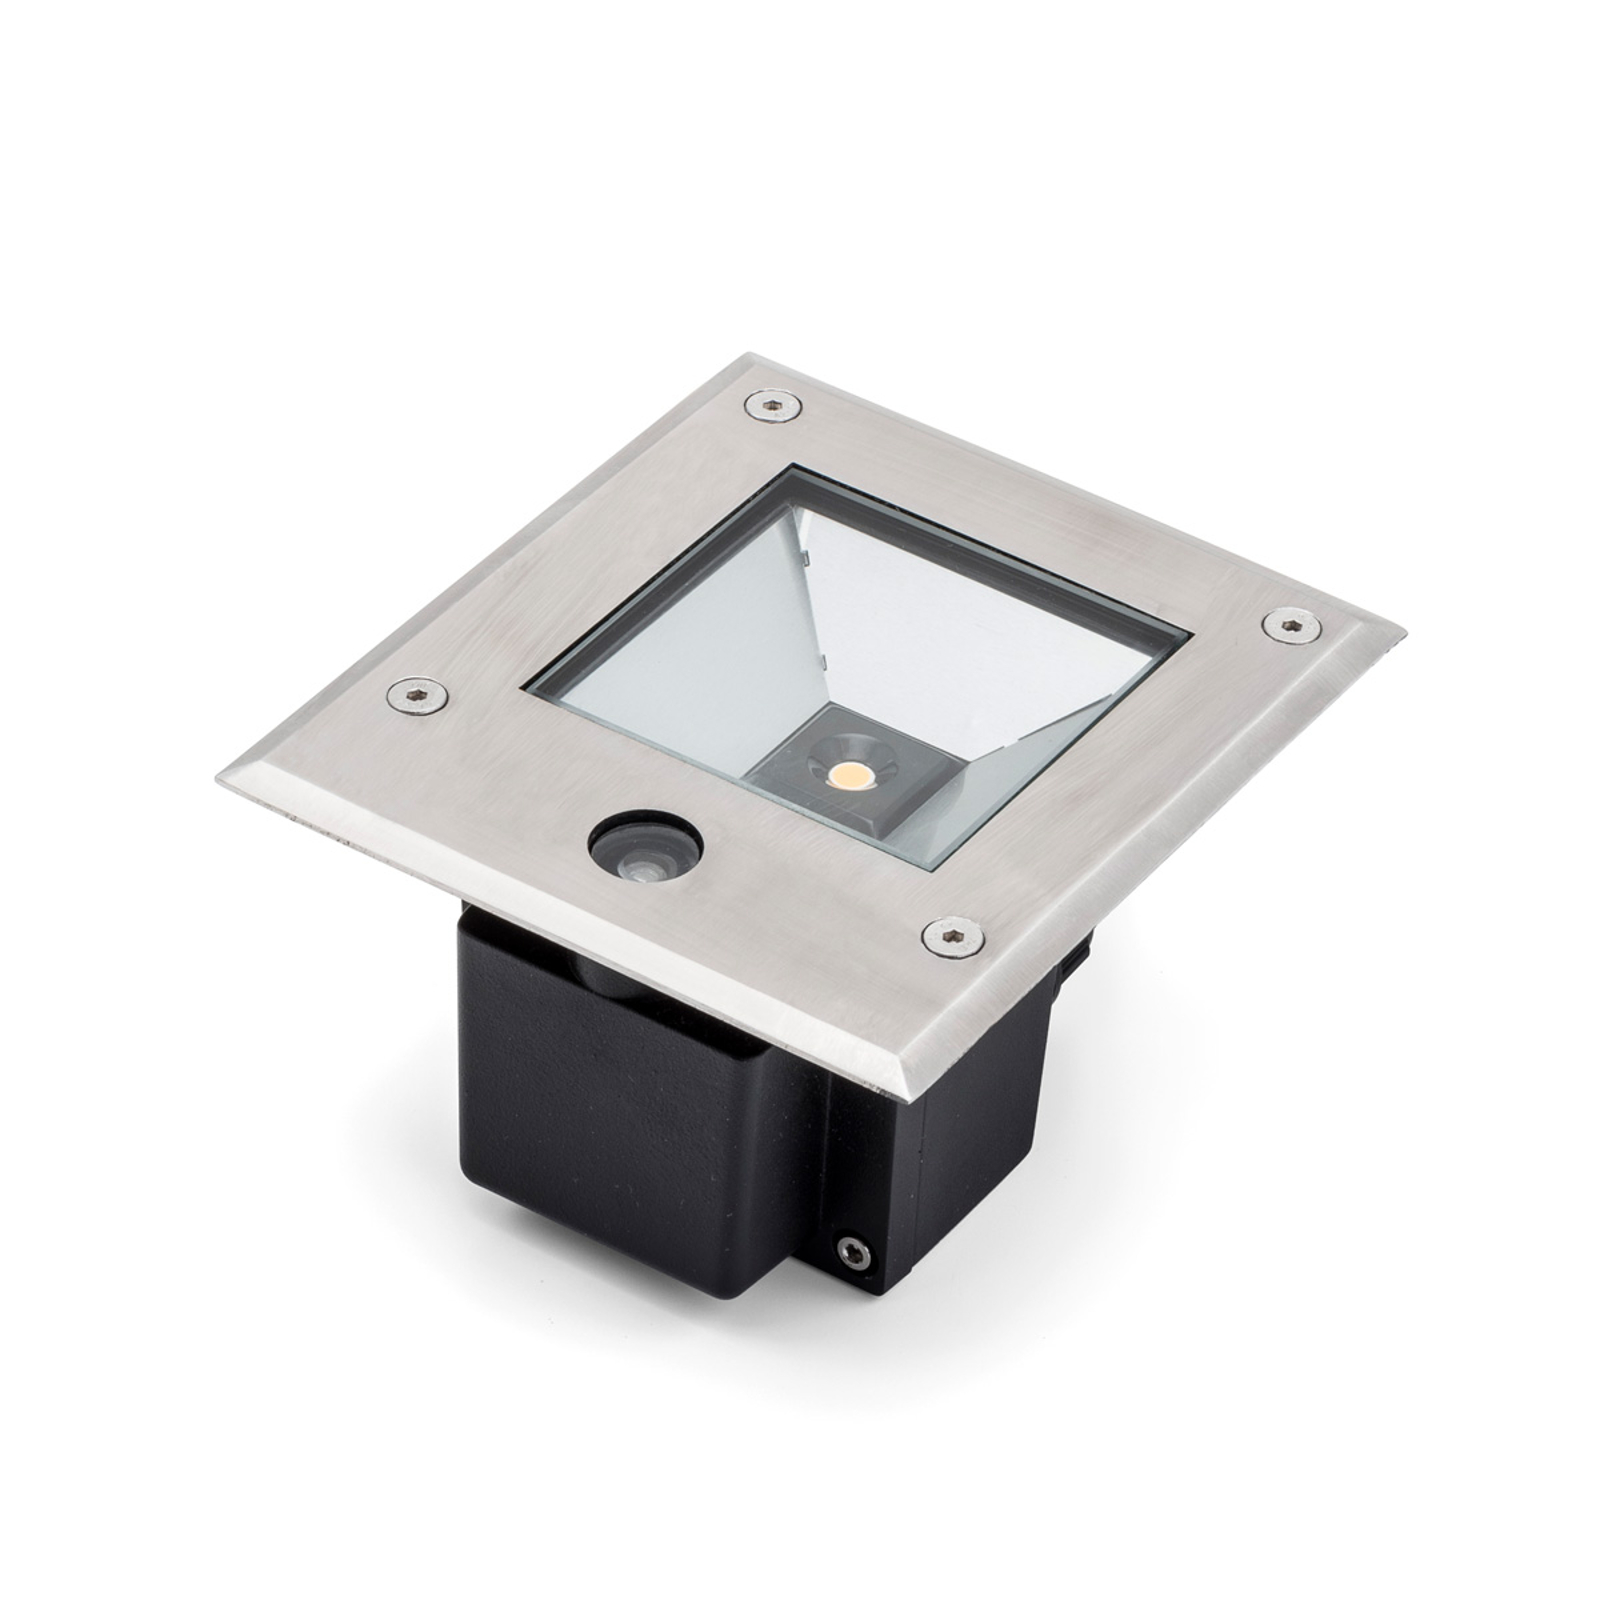 Dale LED grondspot 12 W schemersensor